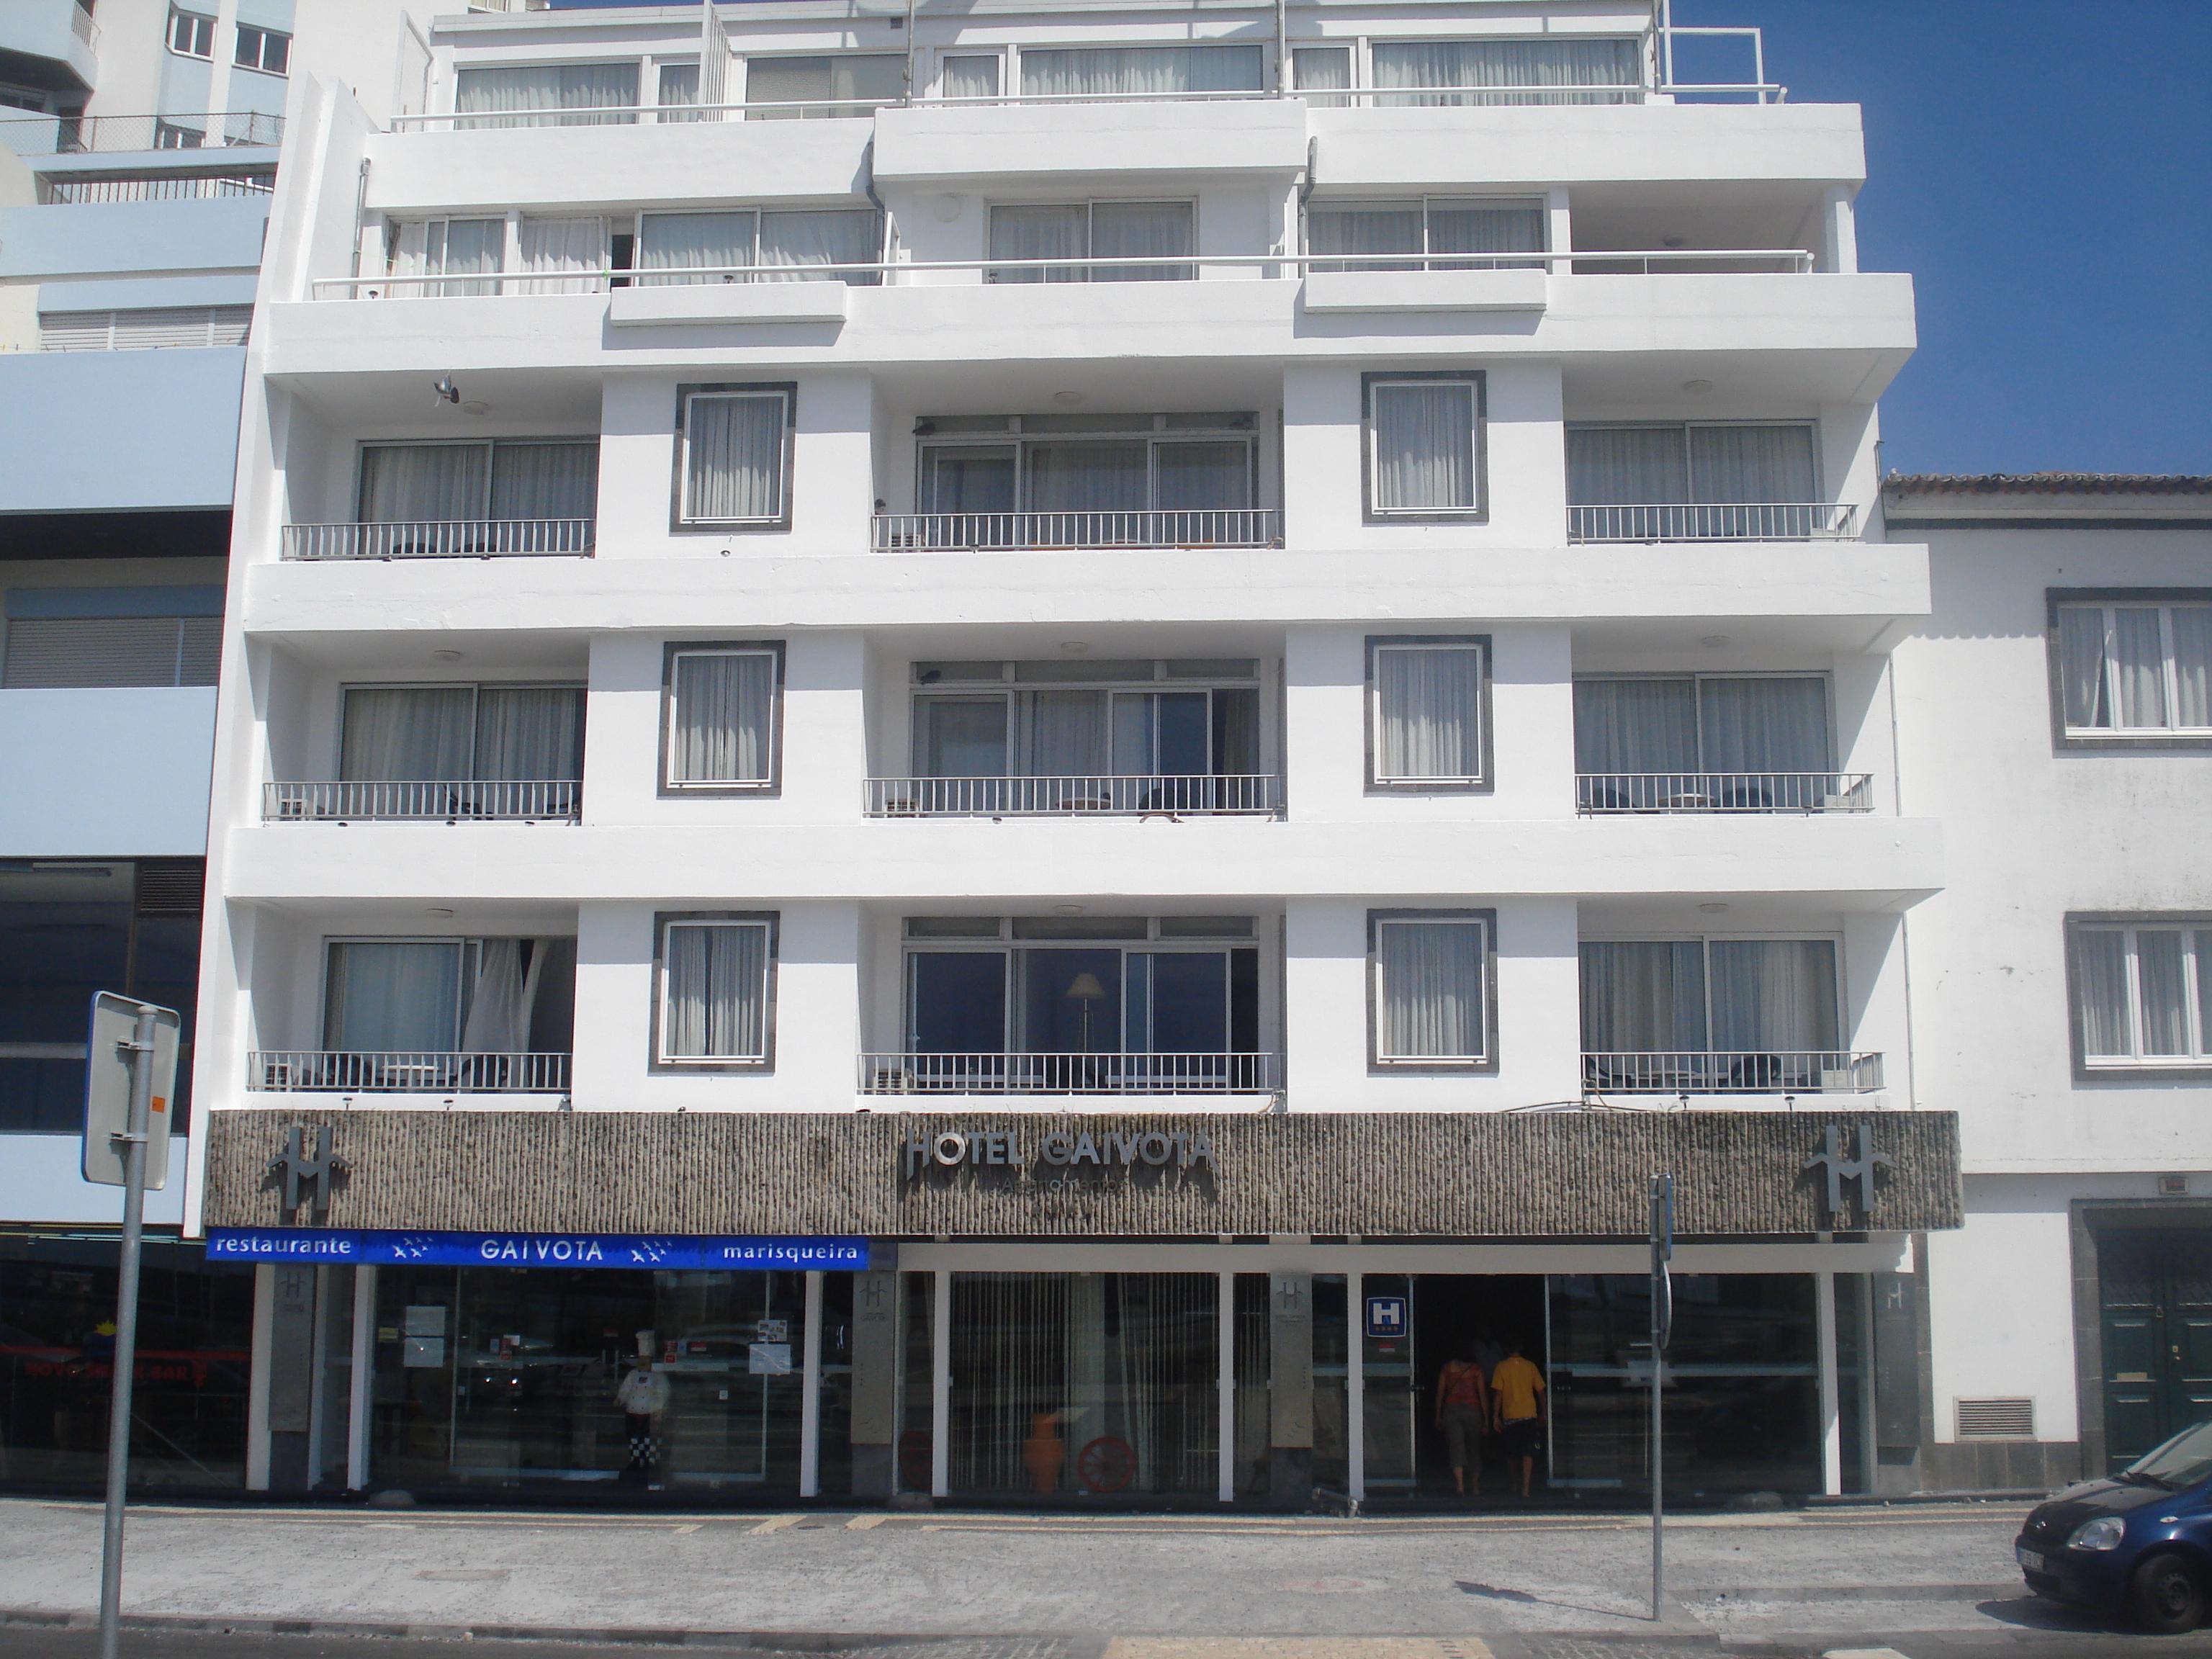 Curtain stock images image 27213424 - Filefachada Hotel Apartamentos Gaivotajpg Wikimedia